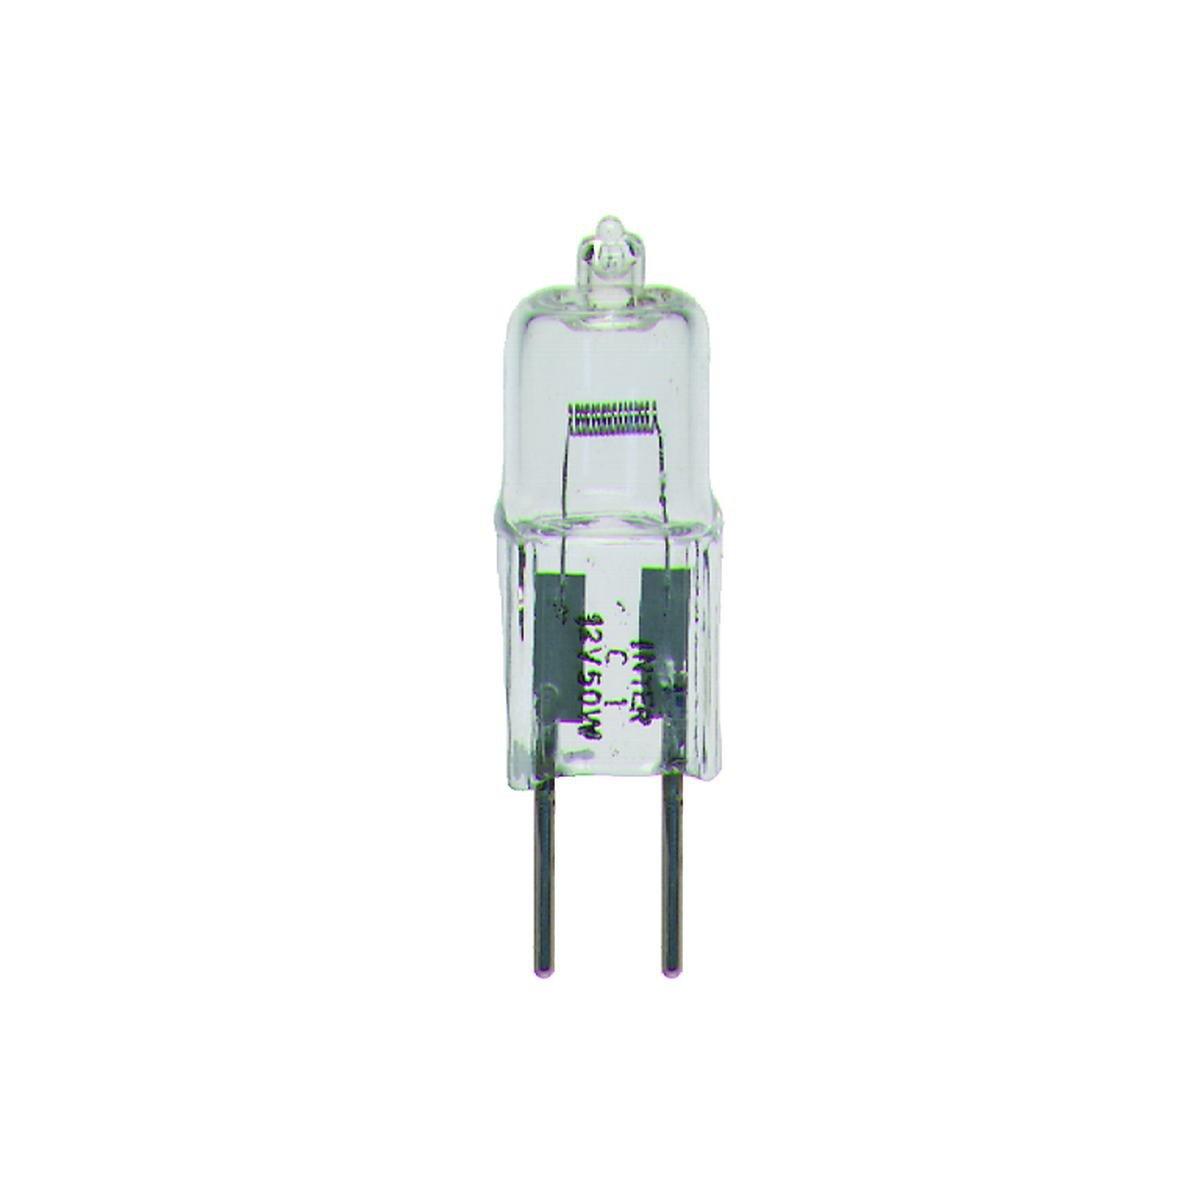 Halogenlampa 12V 10W G4